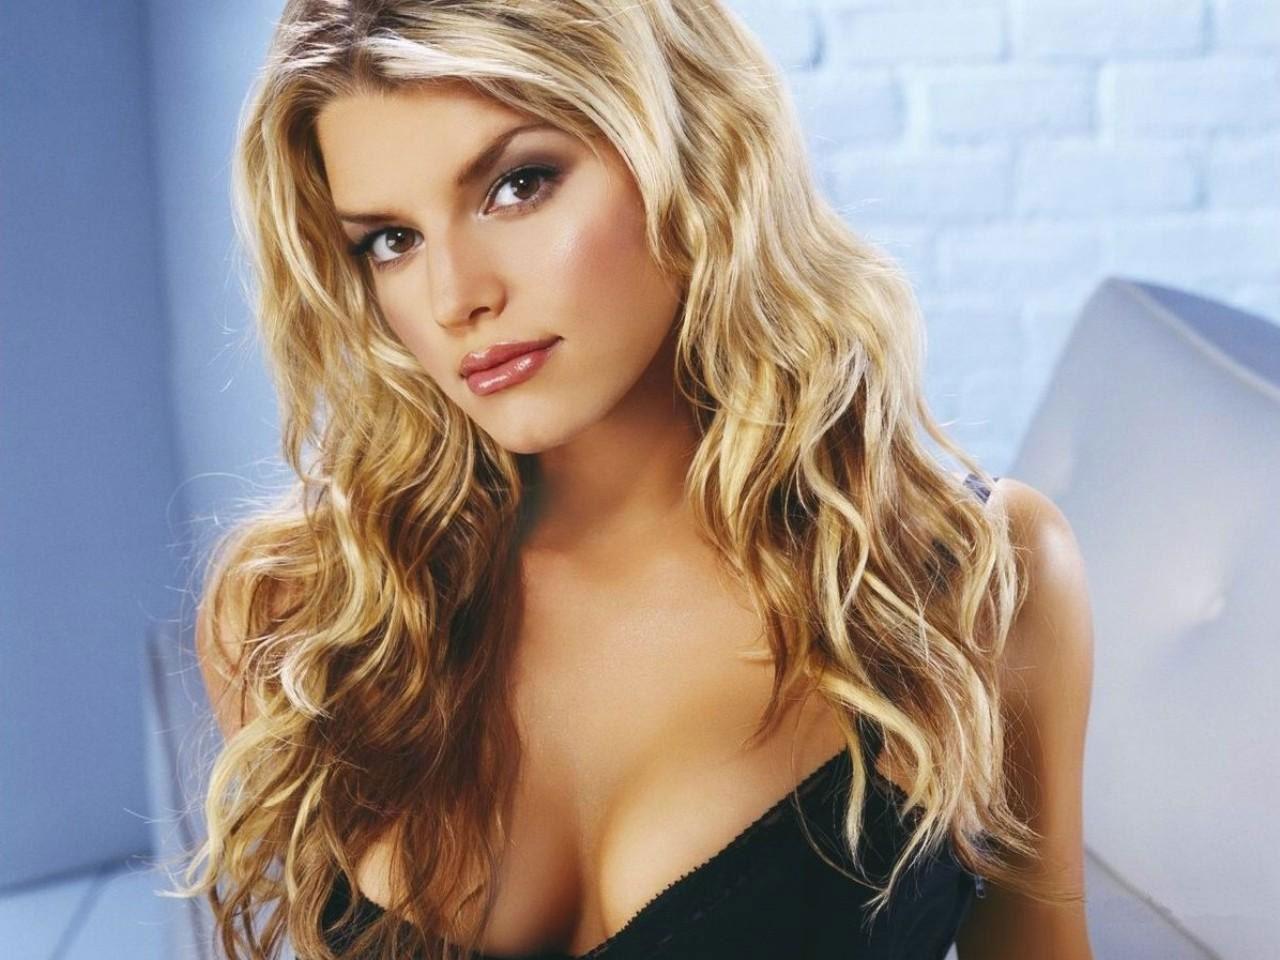 http://4.bp.blogspot.com/-TvCGKzPsFrY/TamVi5rlKpI/AAAAAAAAB74/GL0msYCveFU/s1600/Jessica-Simpson-Curly-Hairstyle-Picrure.jpg